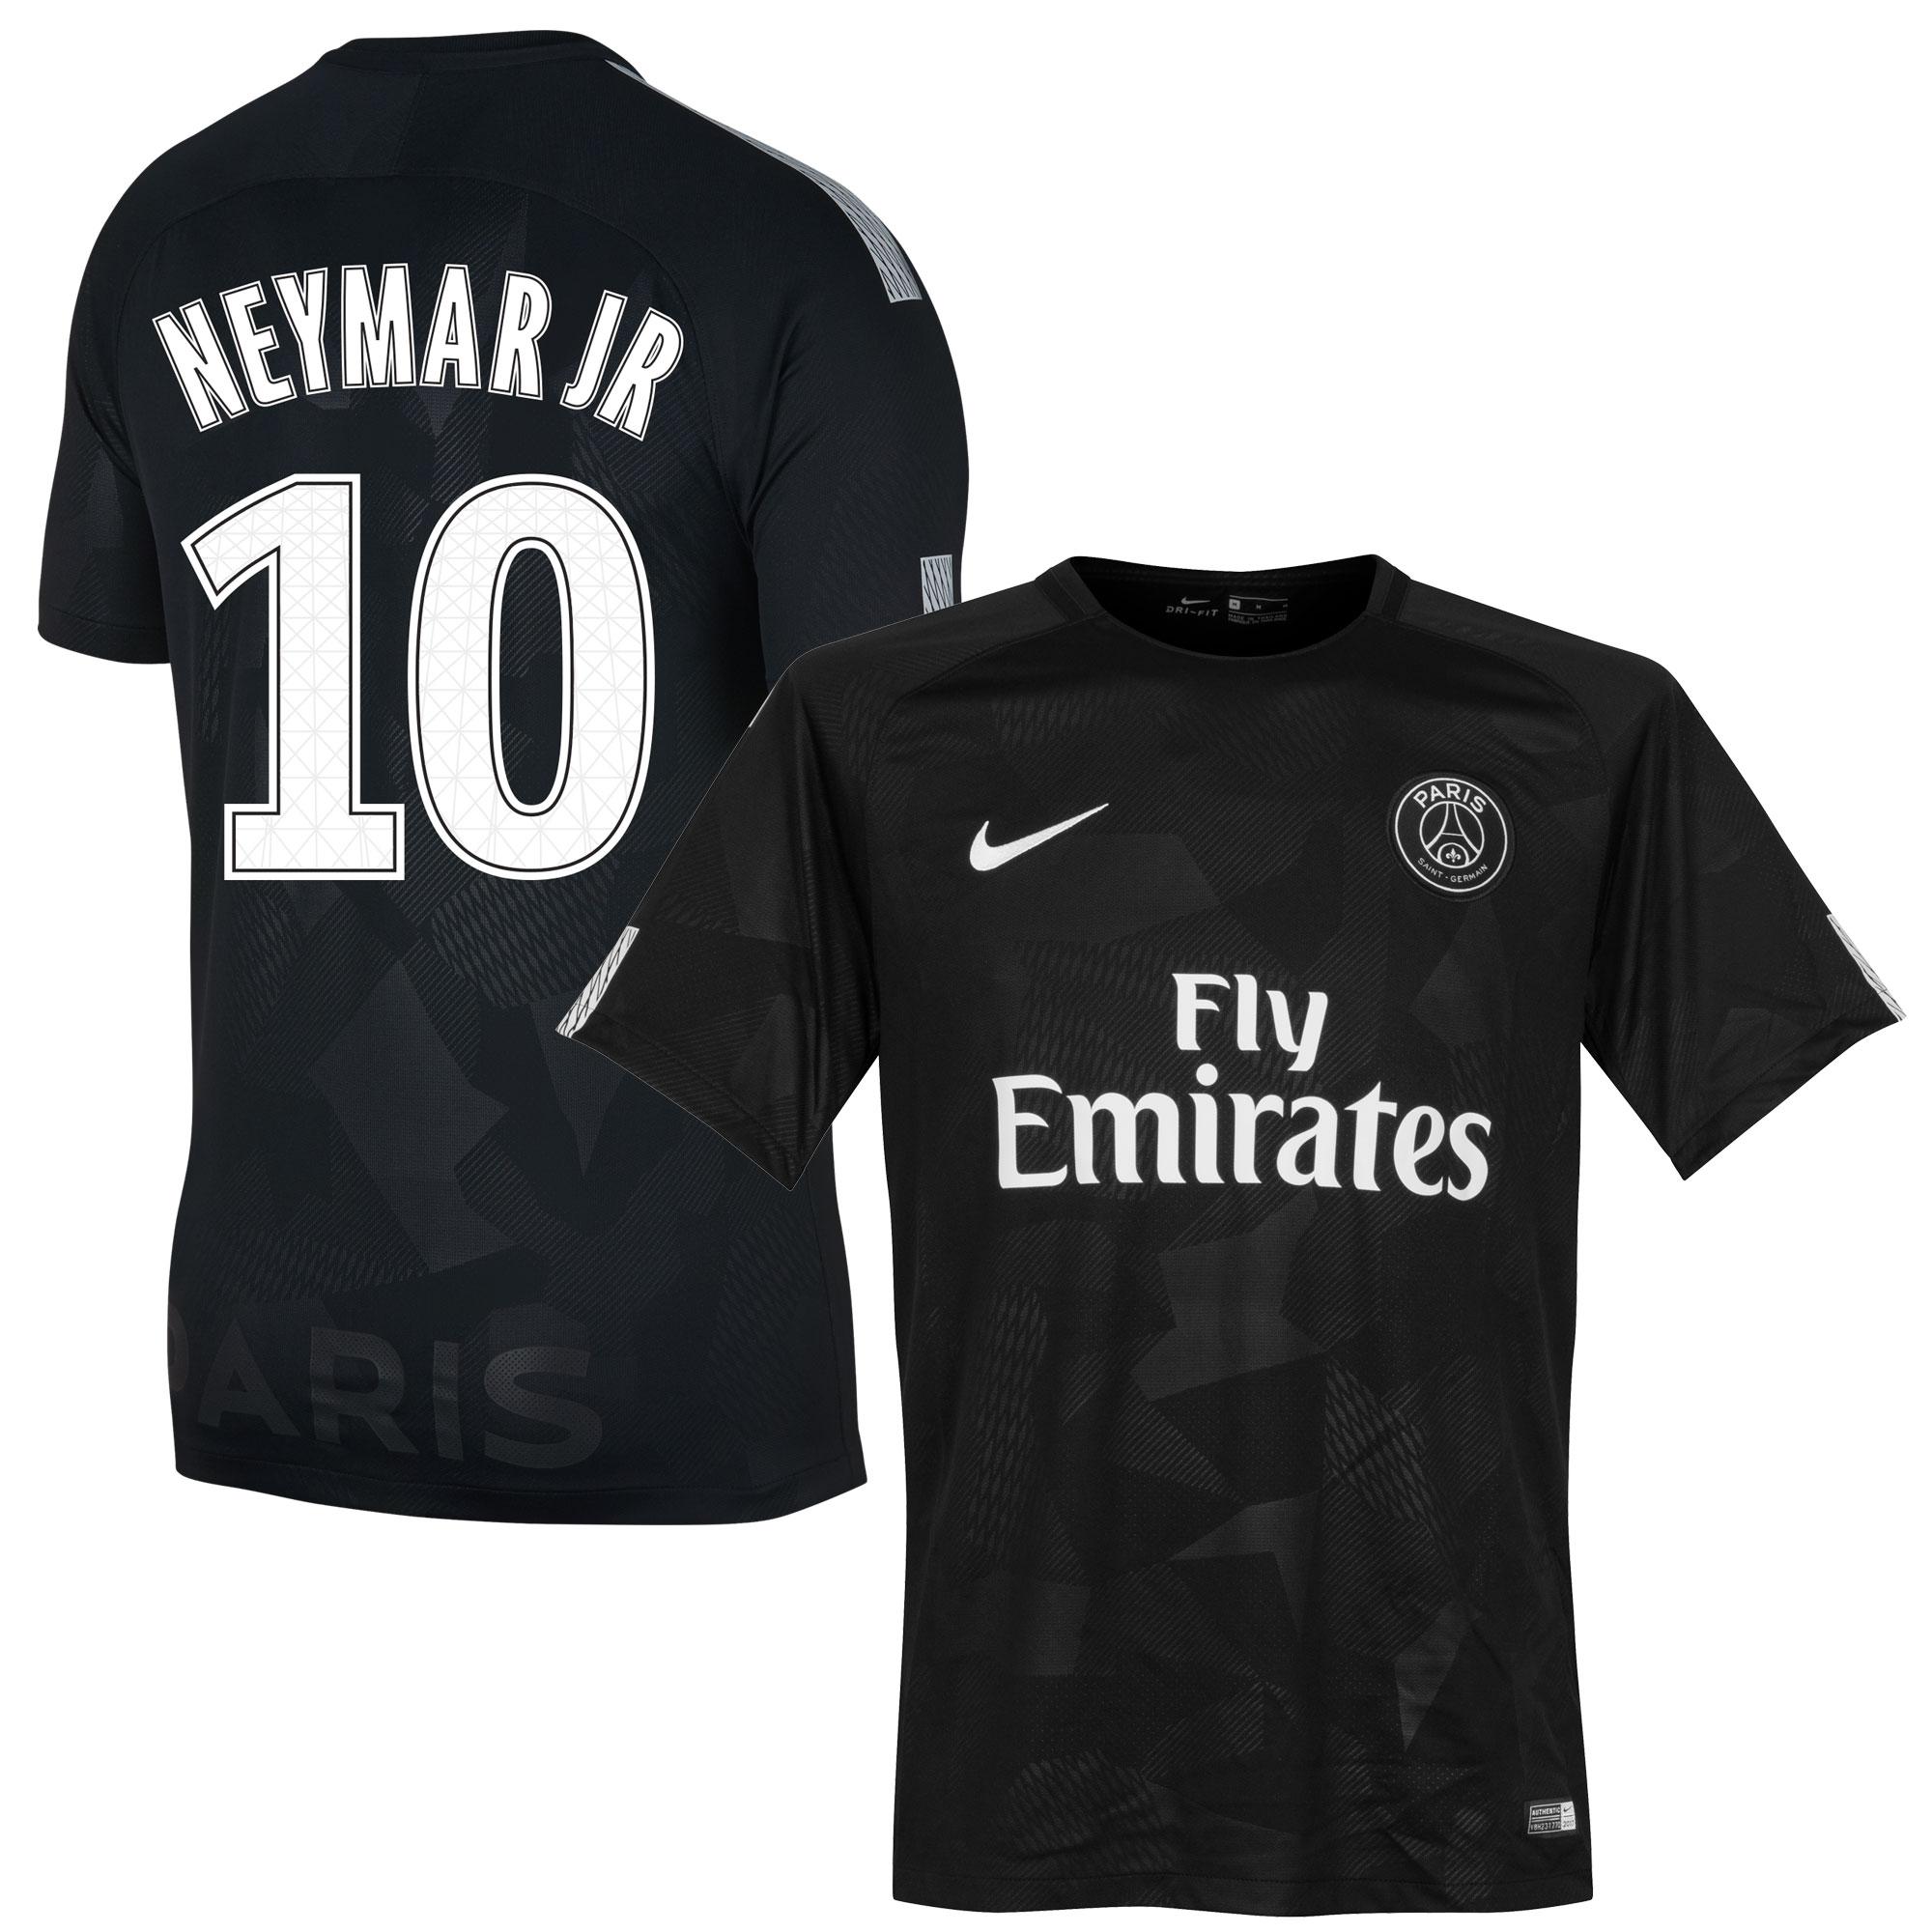 PSG 3rd Neymar Jr Jersey 2017 / 2018 (Fan Style Printing) - XXL